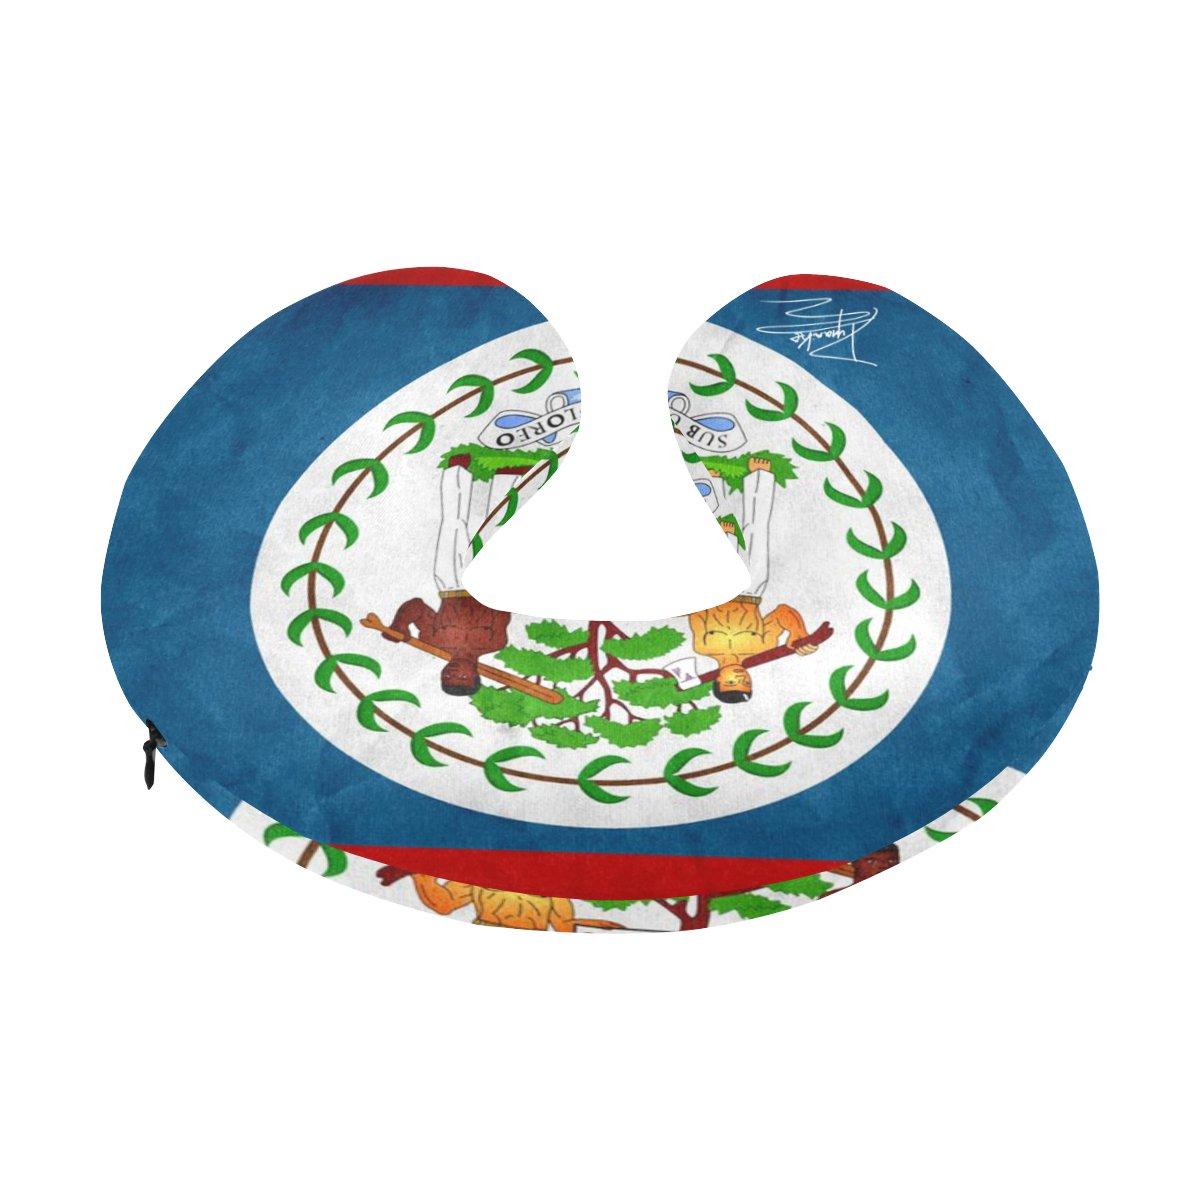 Image of Belize - Travel Pillow U-Shape Travel Pillow